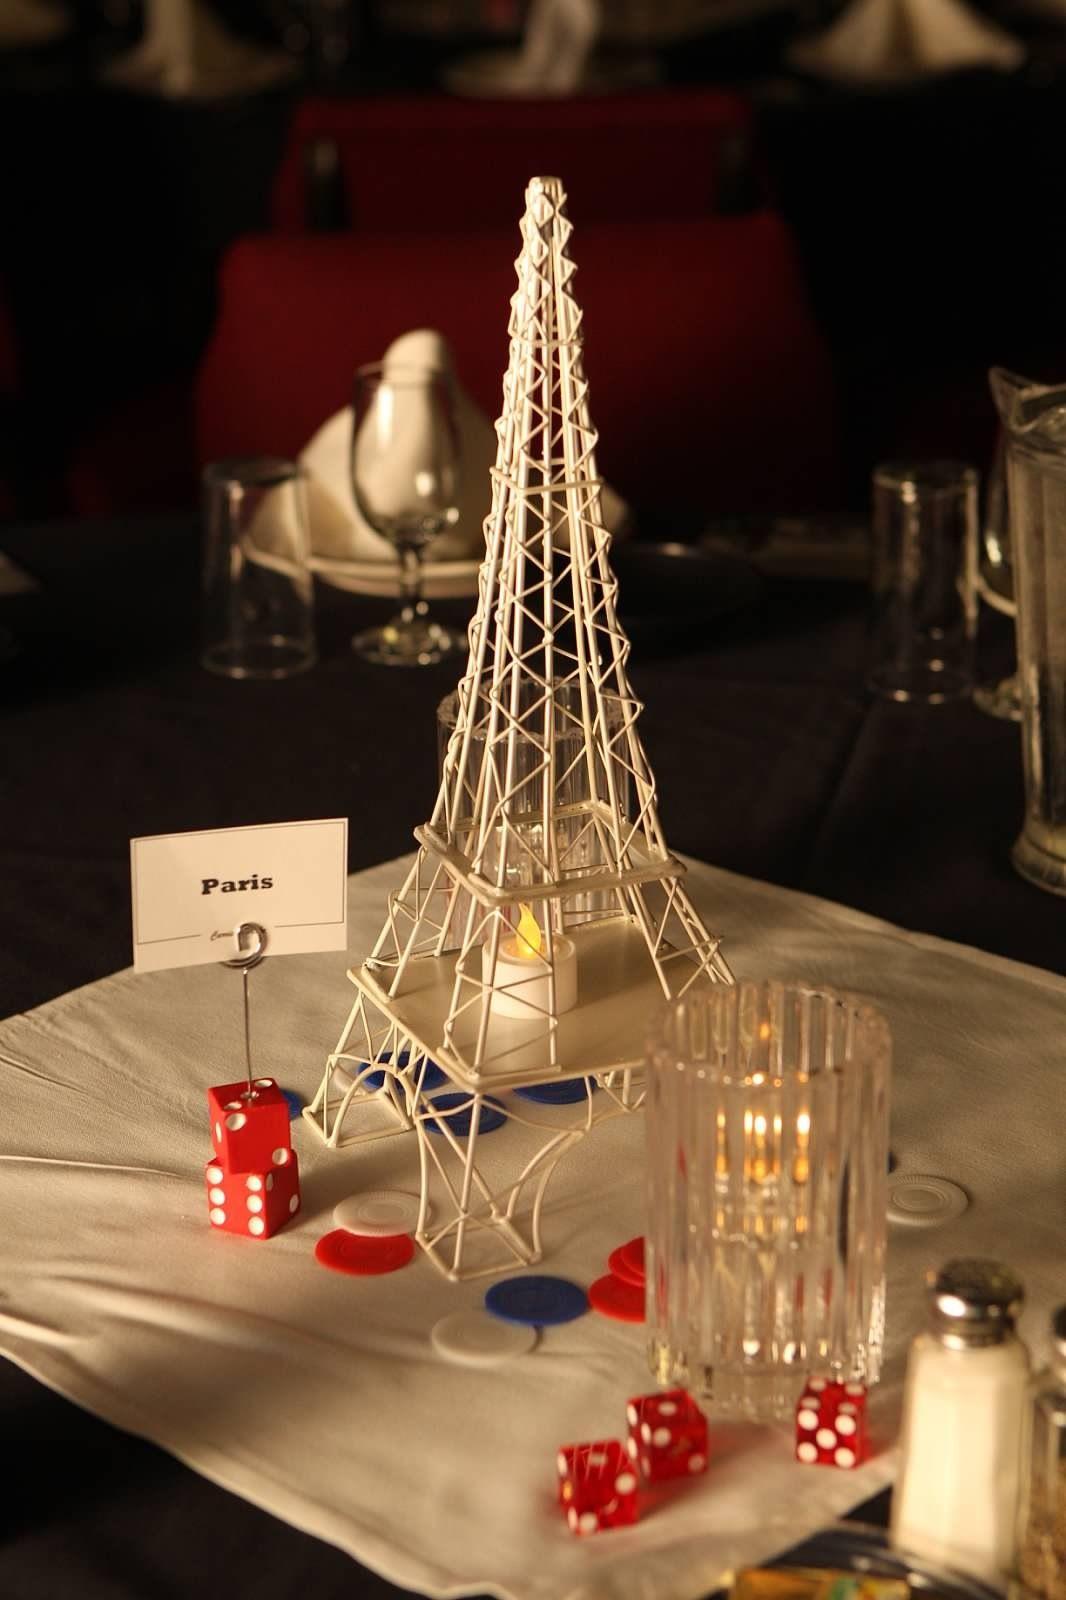 Paris las vegas centerpiece hope love ball ideas